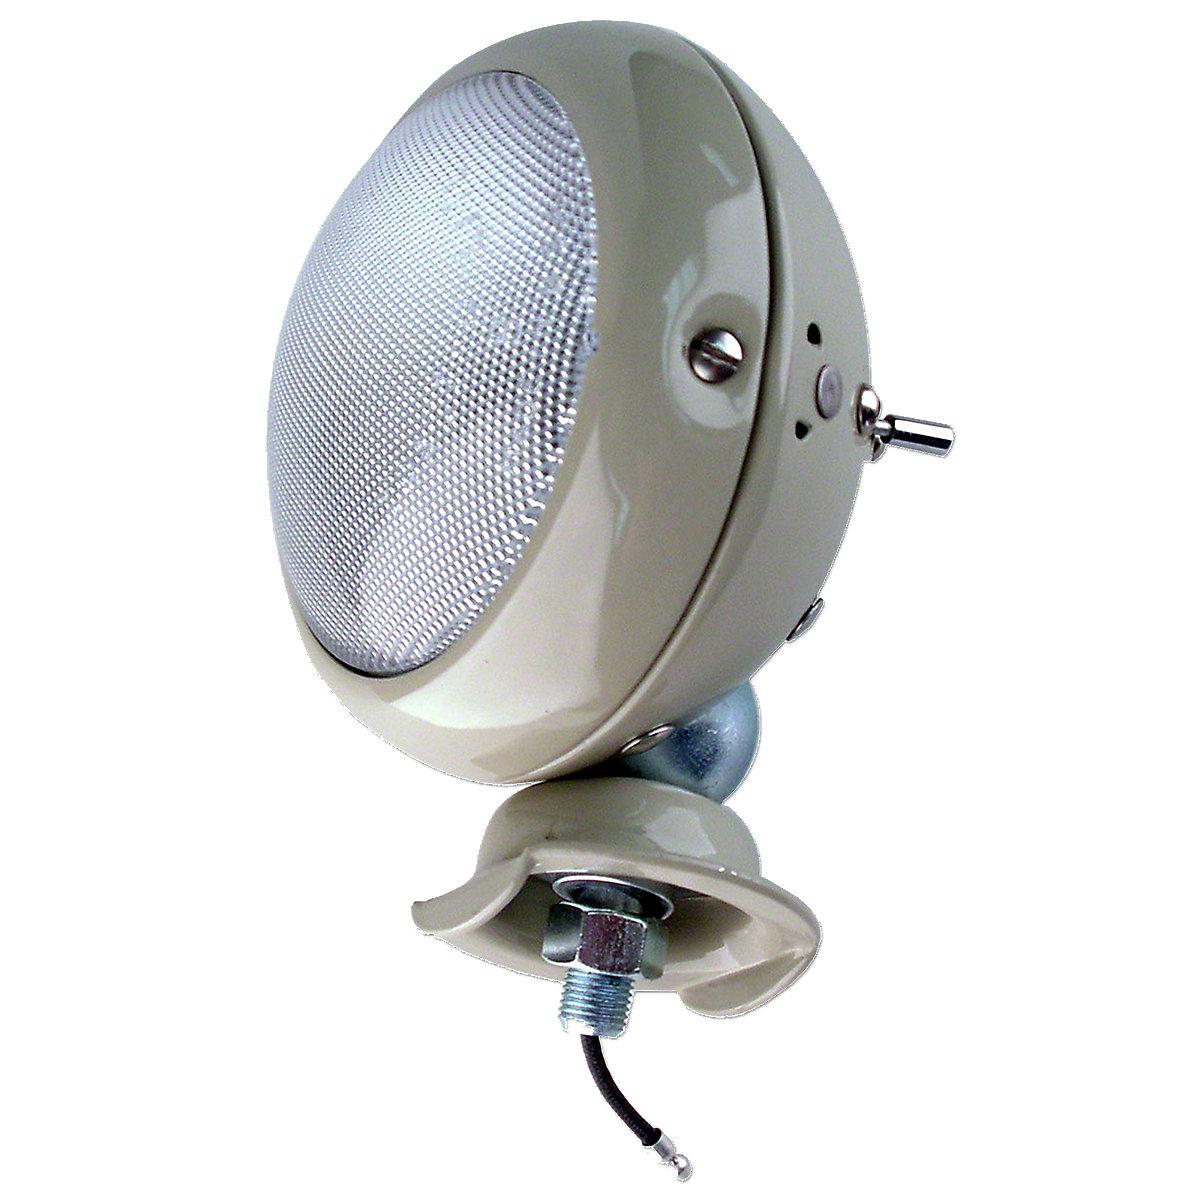 6 Volt Work Light Assembly For Massey Ferguson: TE20, TO20, TO30.